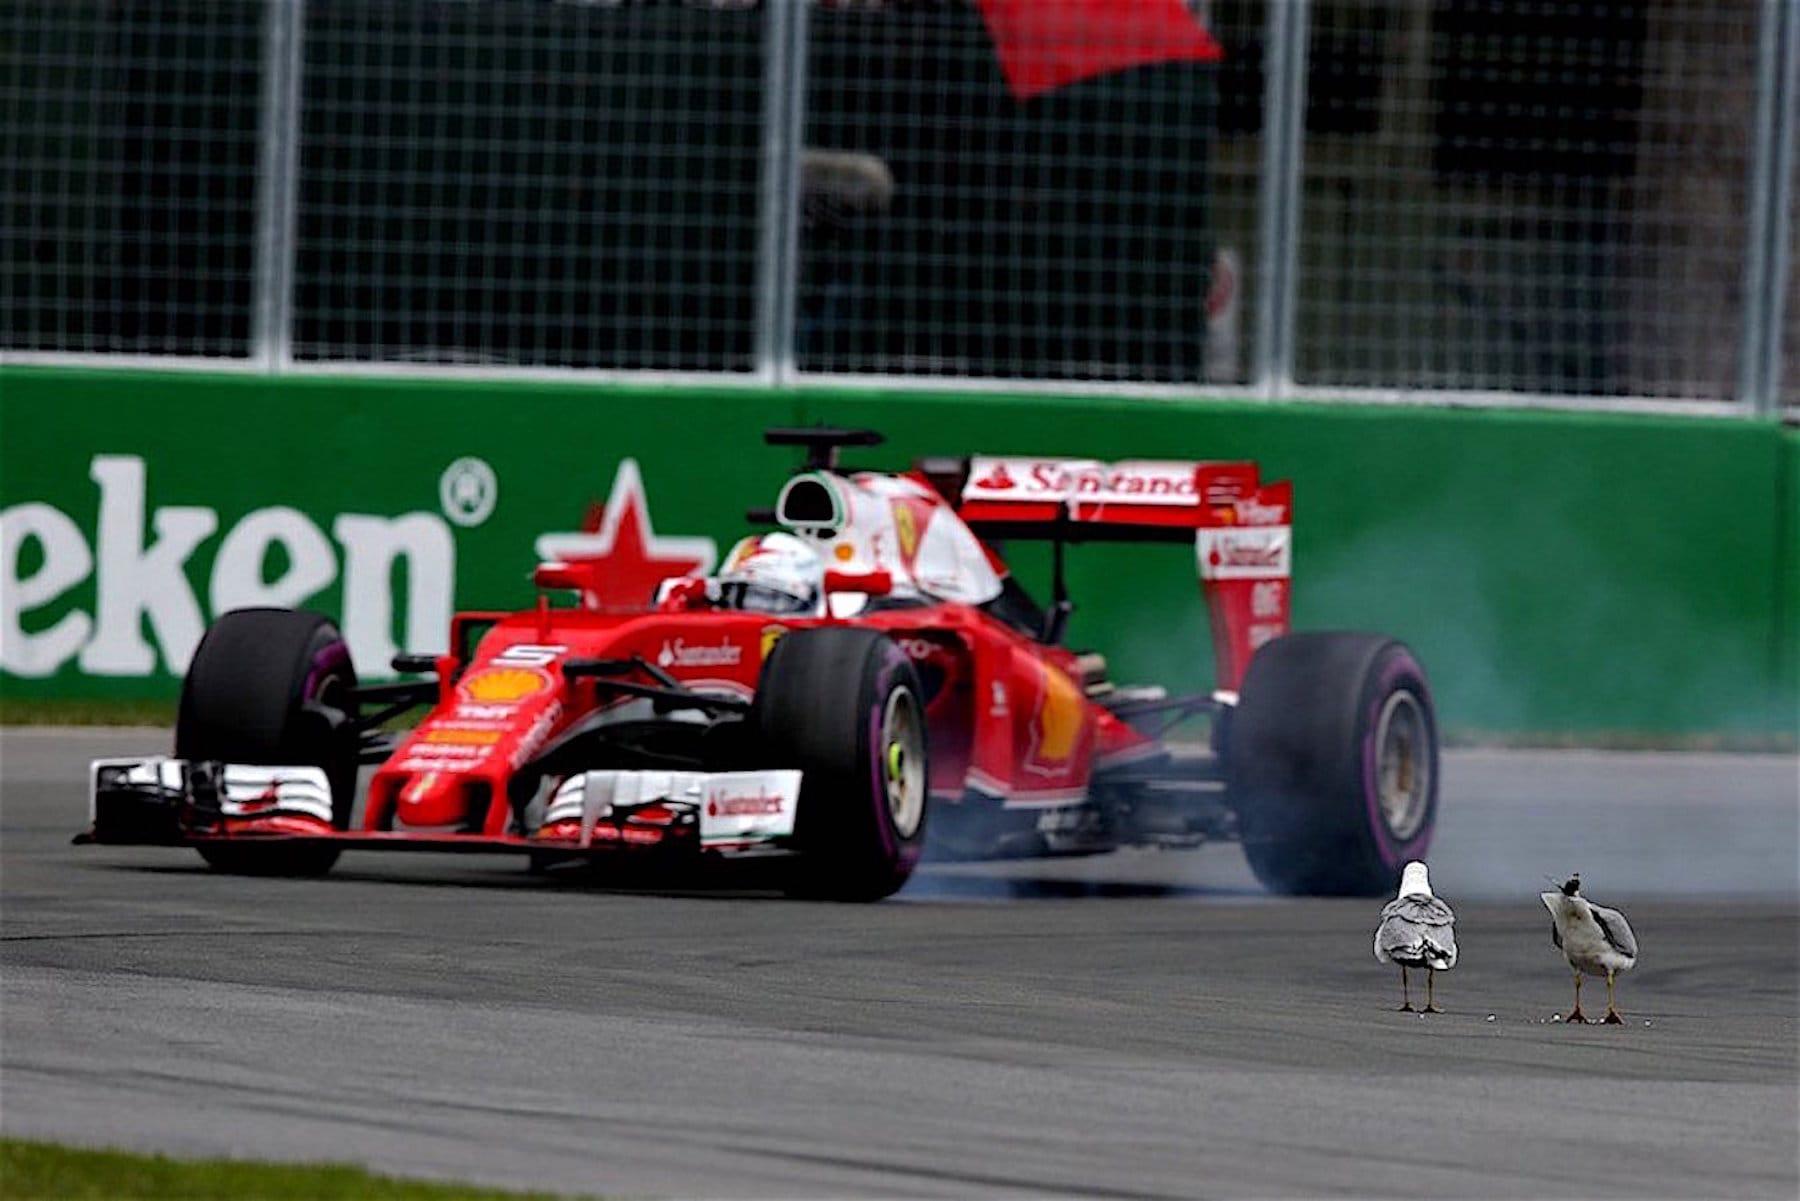 Salracing - Sebastian Vettel and the Seagulls